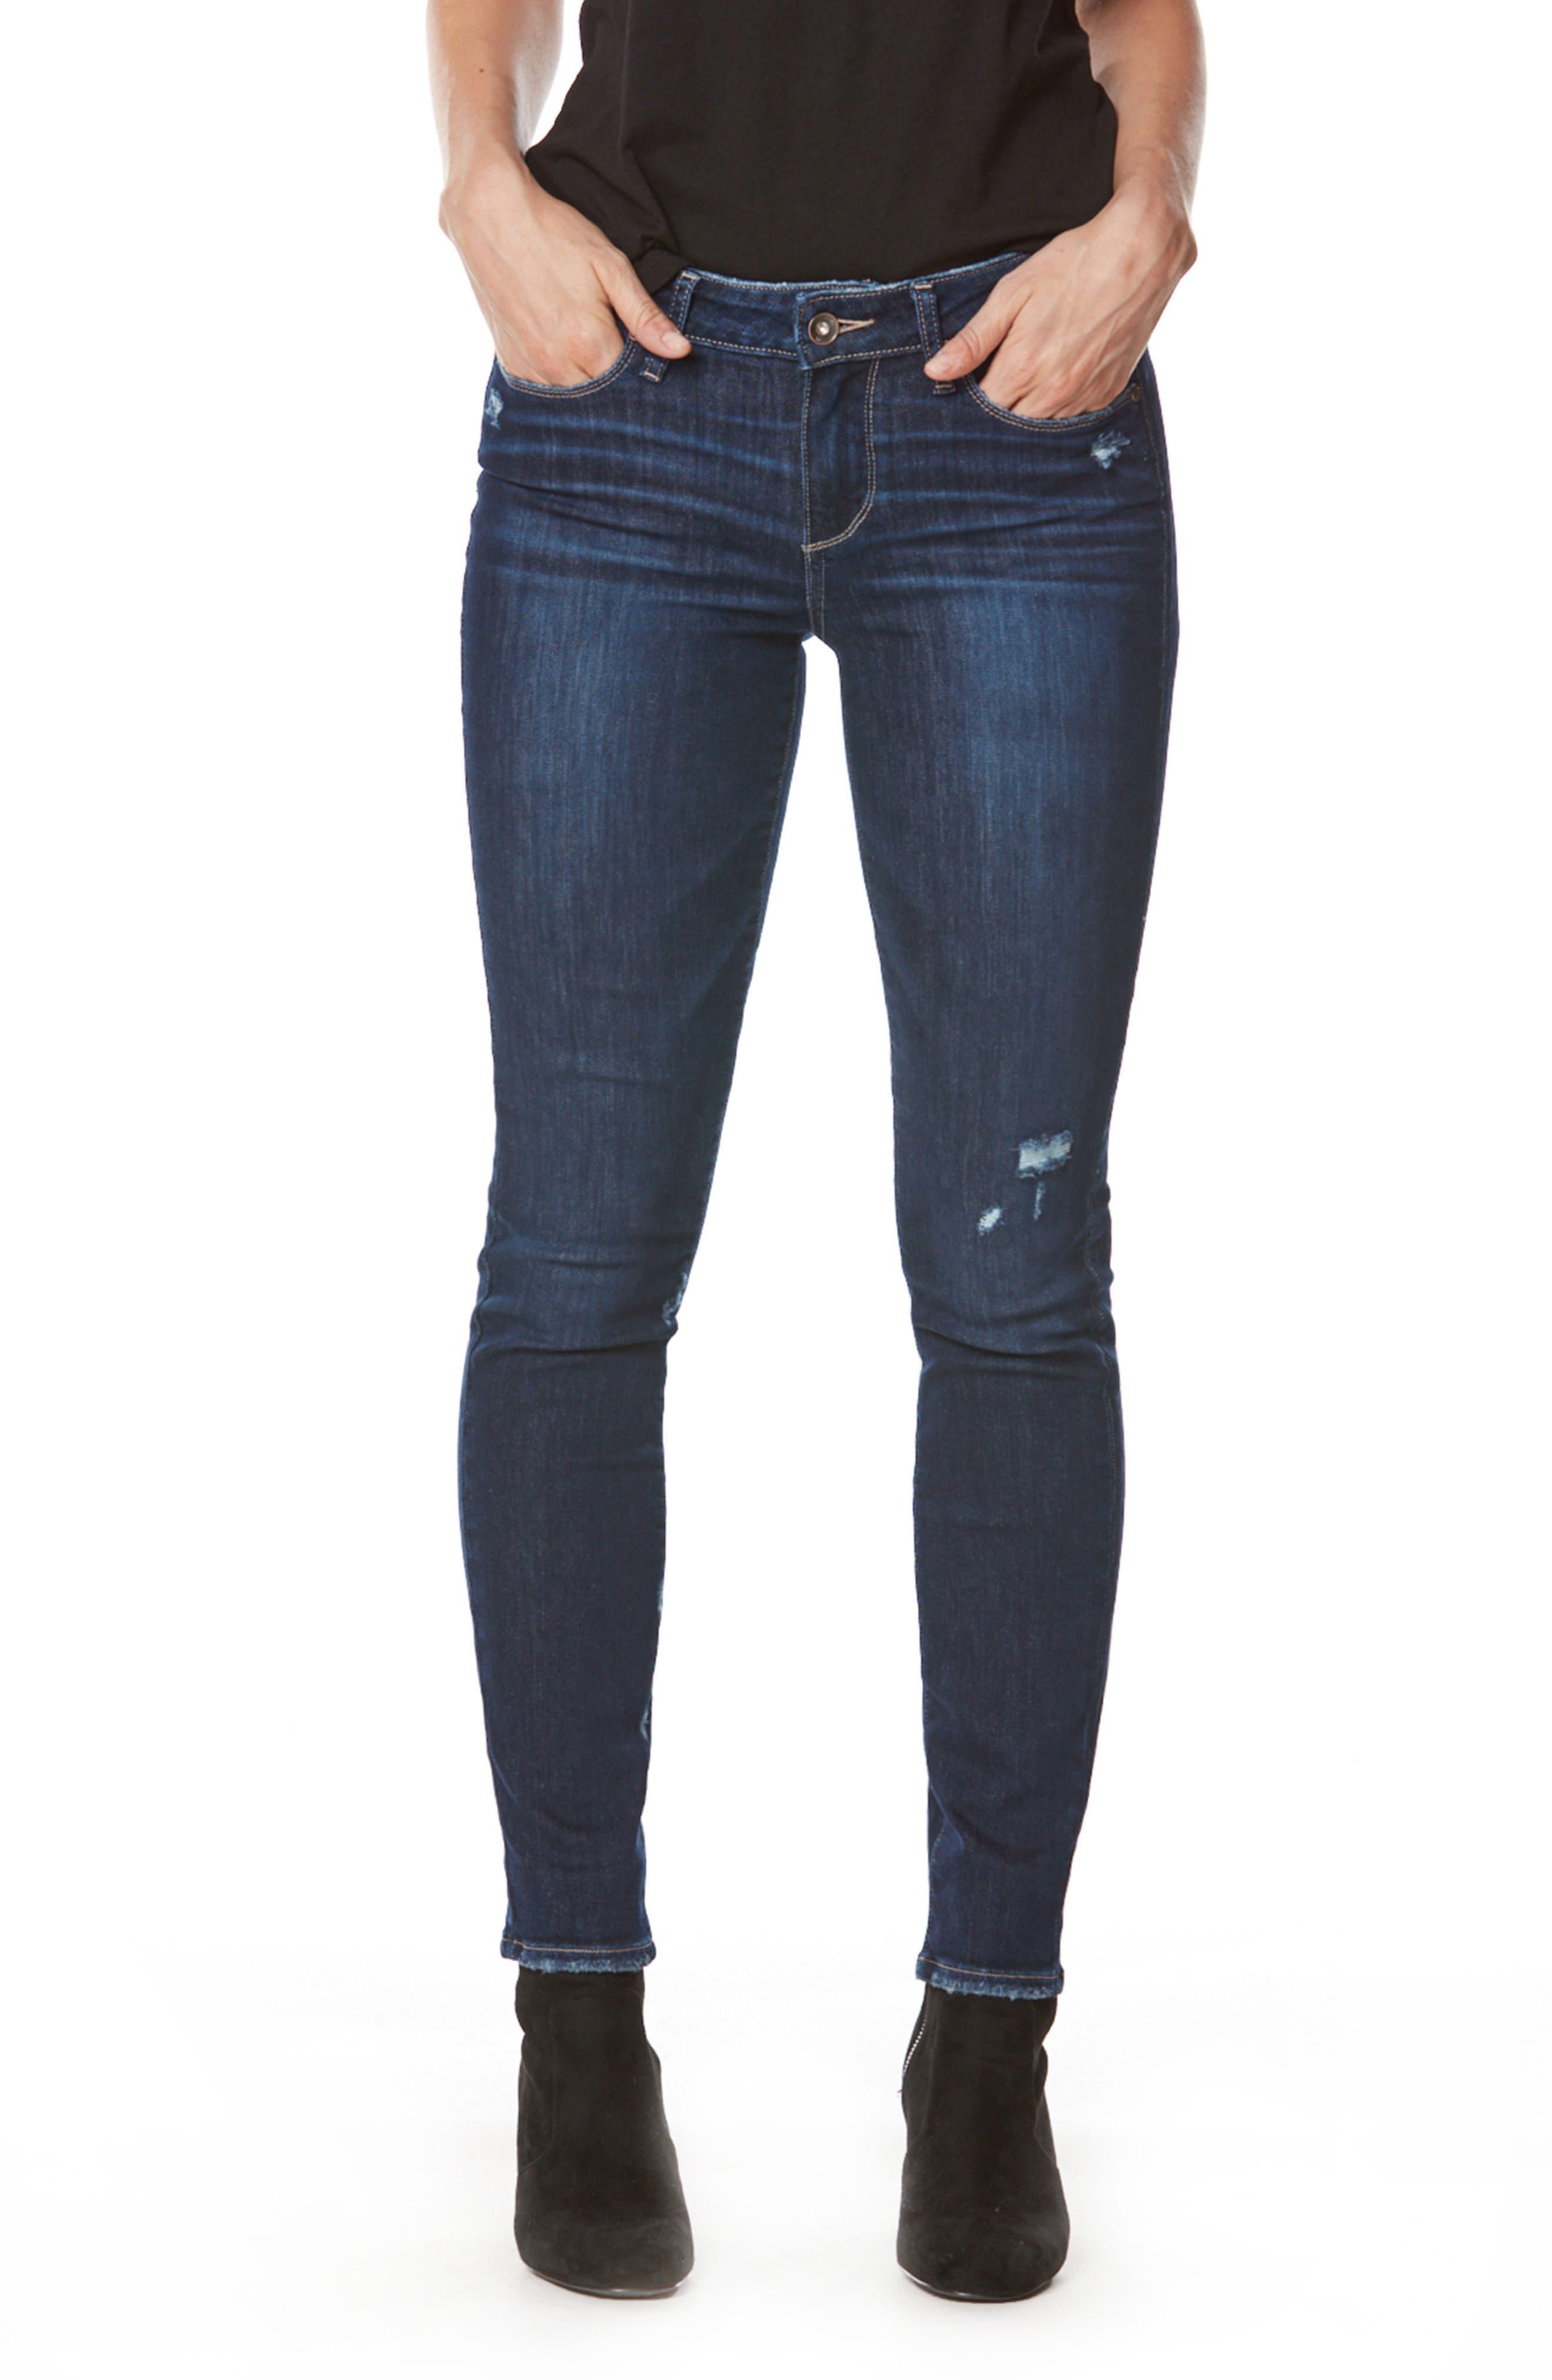 Transcend - Verdugo Ultra Skinny Jeans,                             Main thumbnail 1, color,                             Davidson Destructed